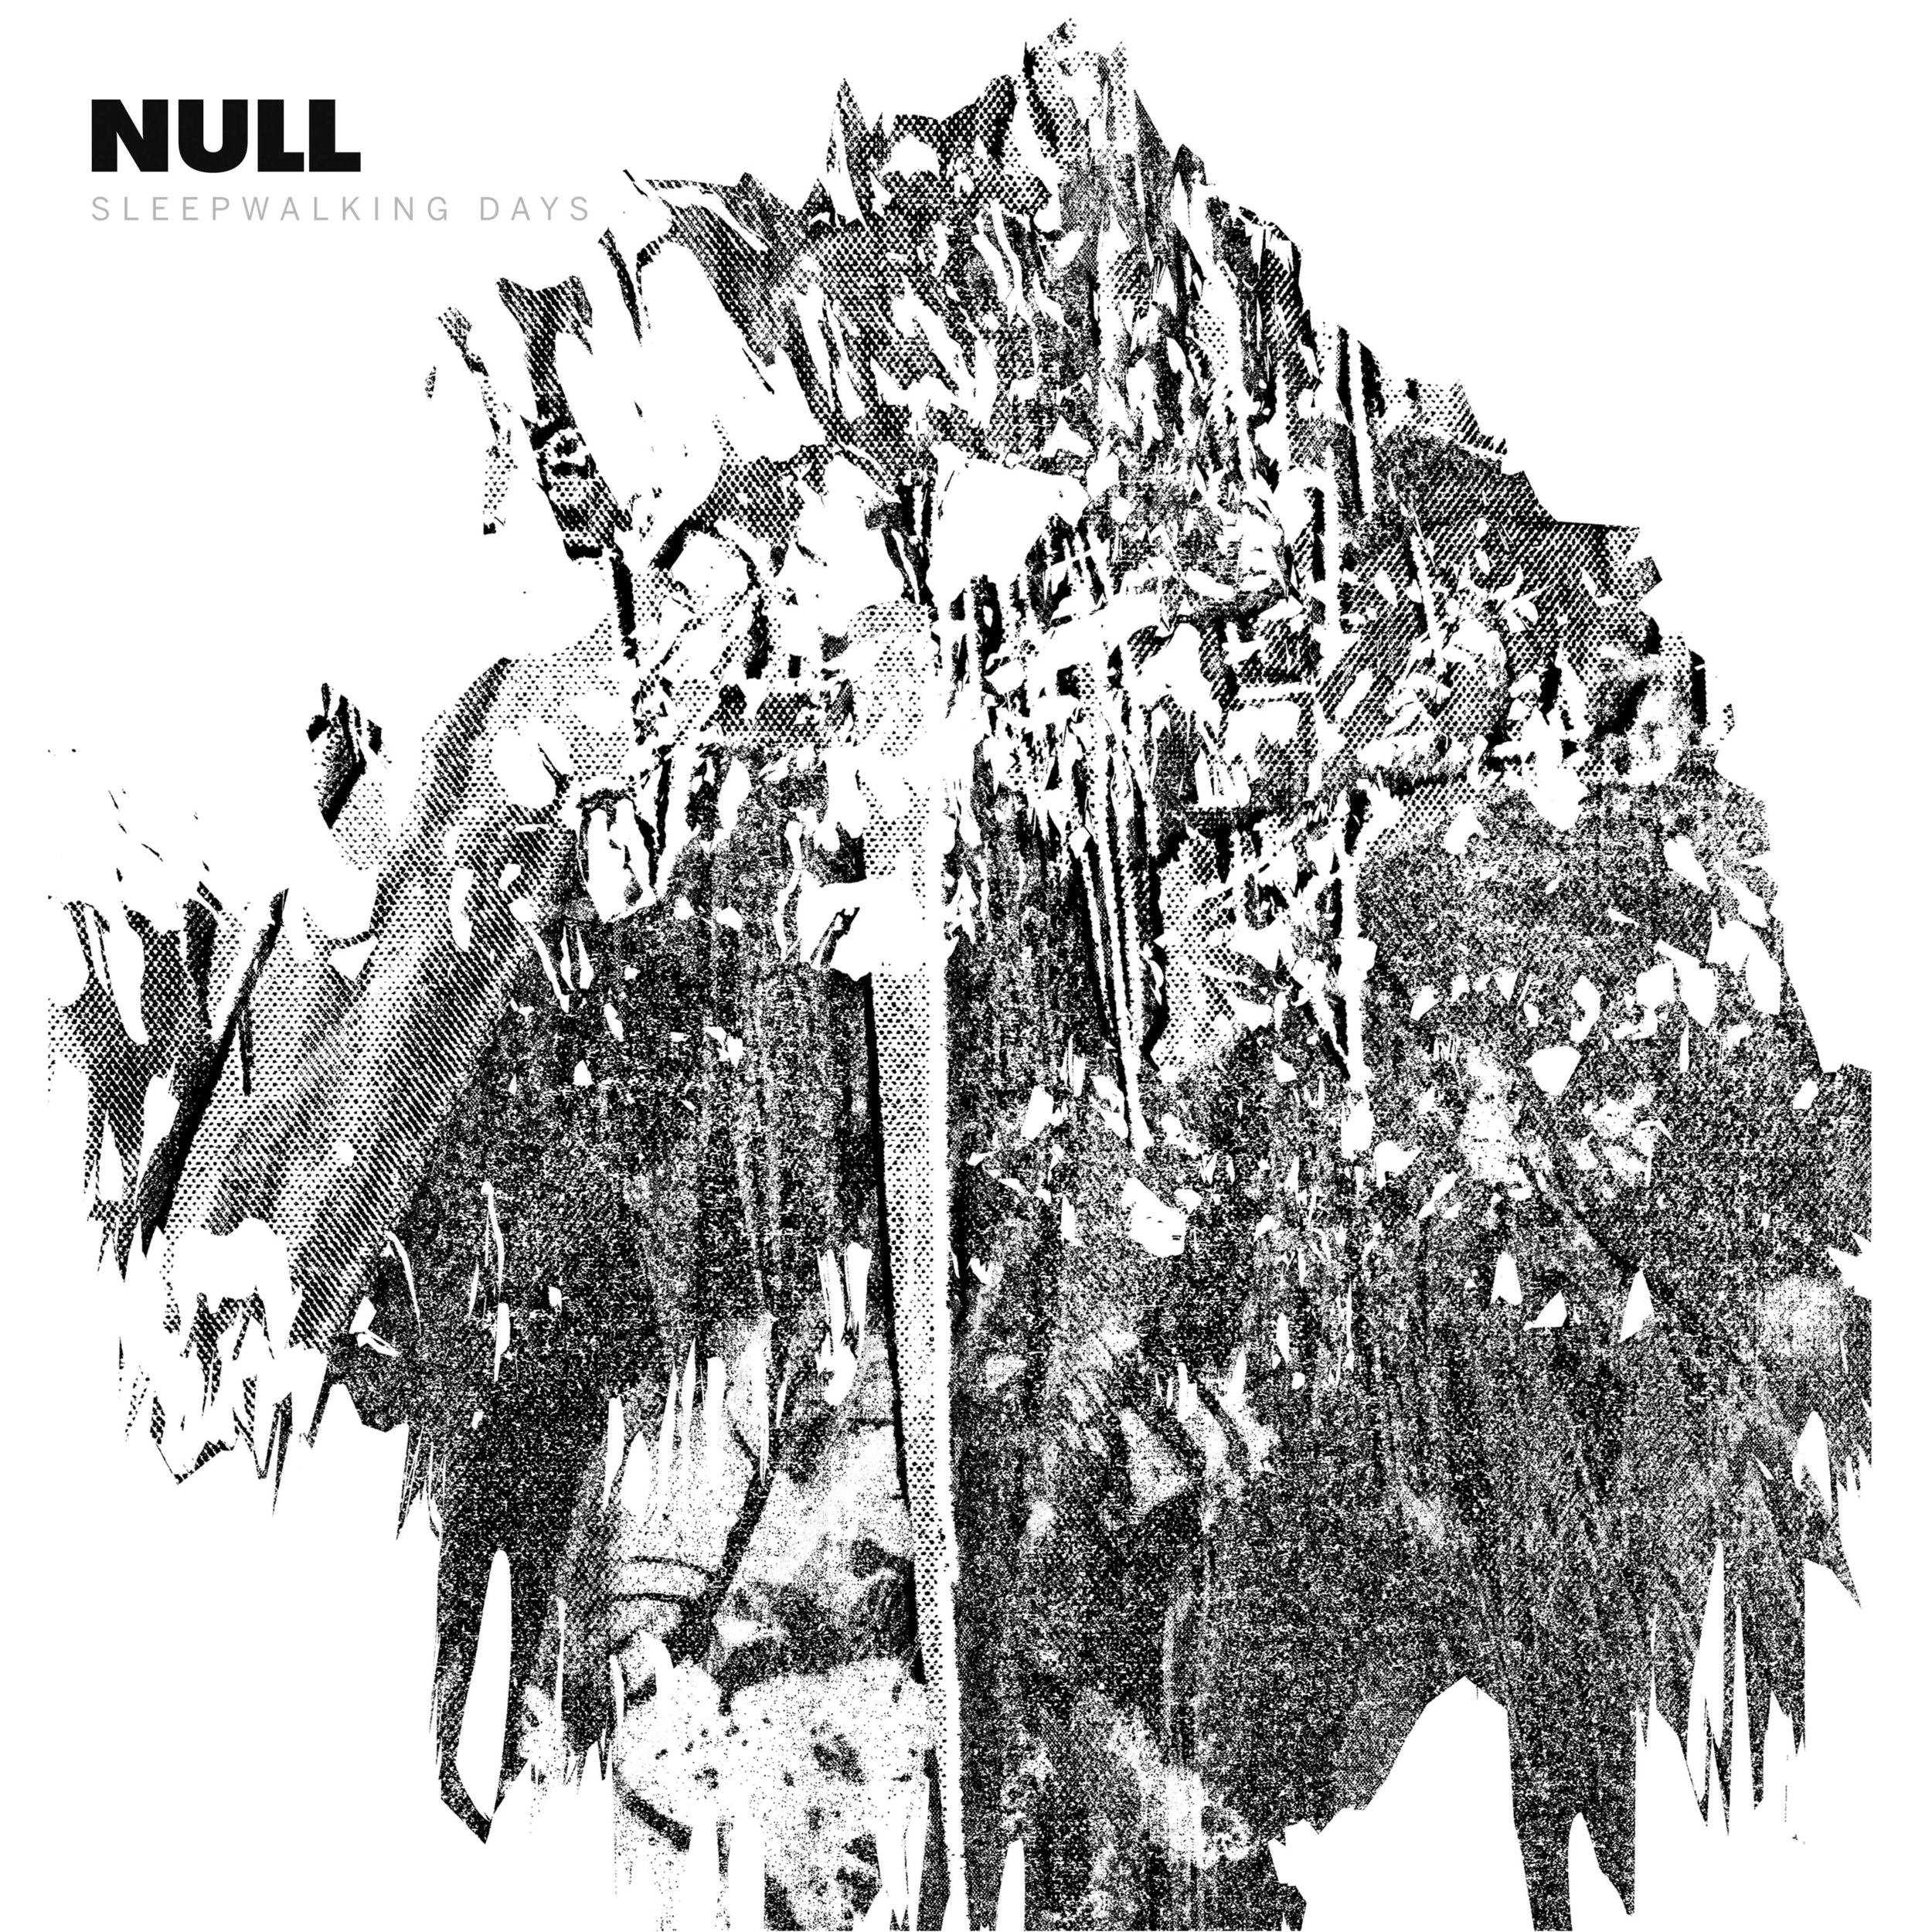 Null - Sleepwalking Days LP - $14